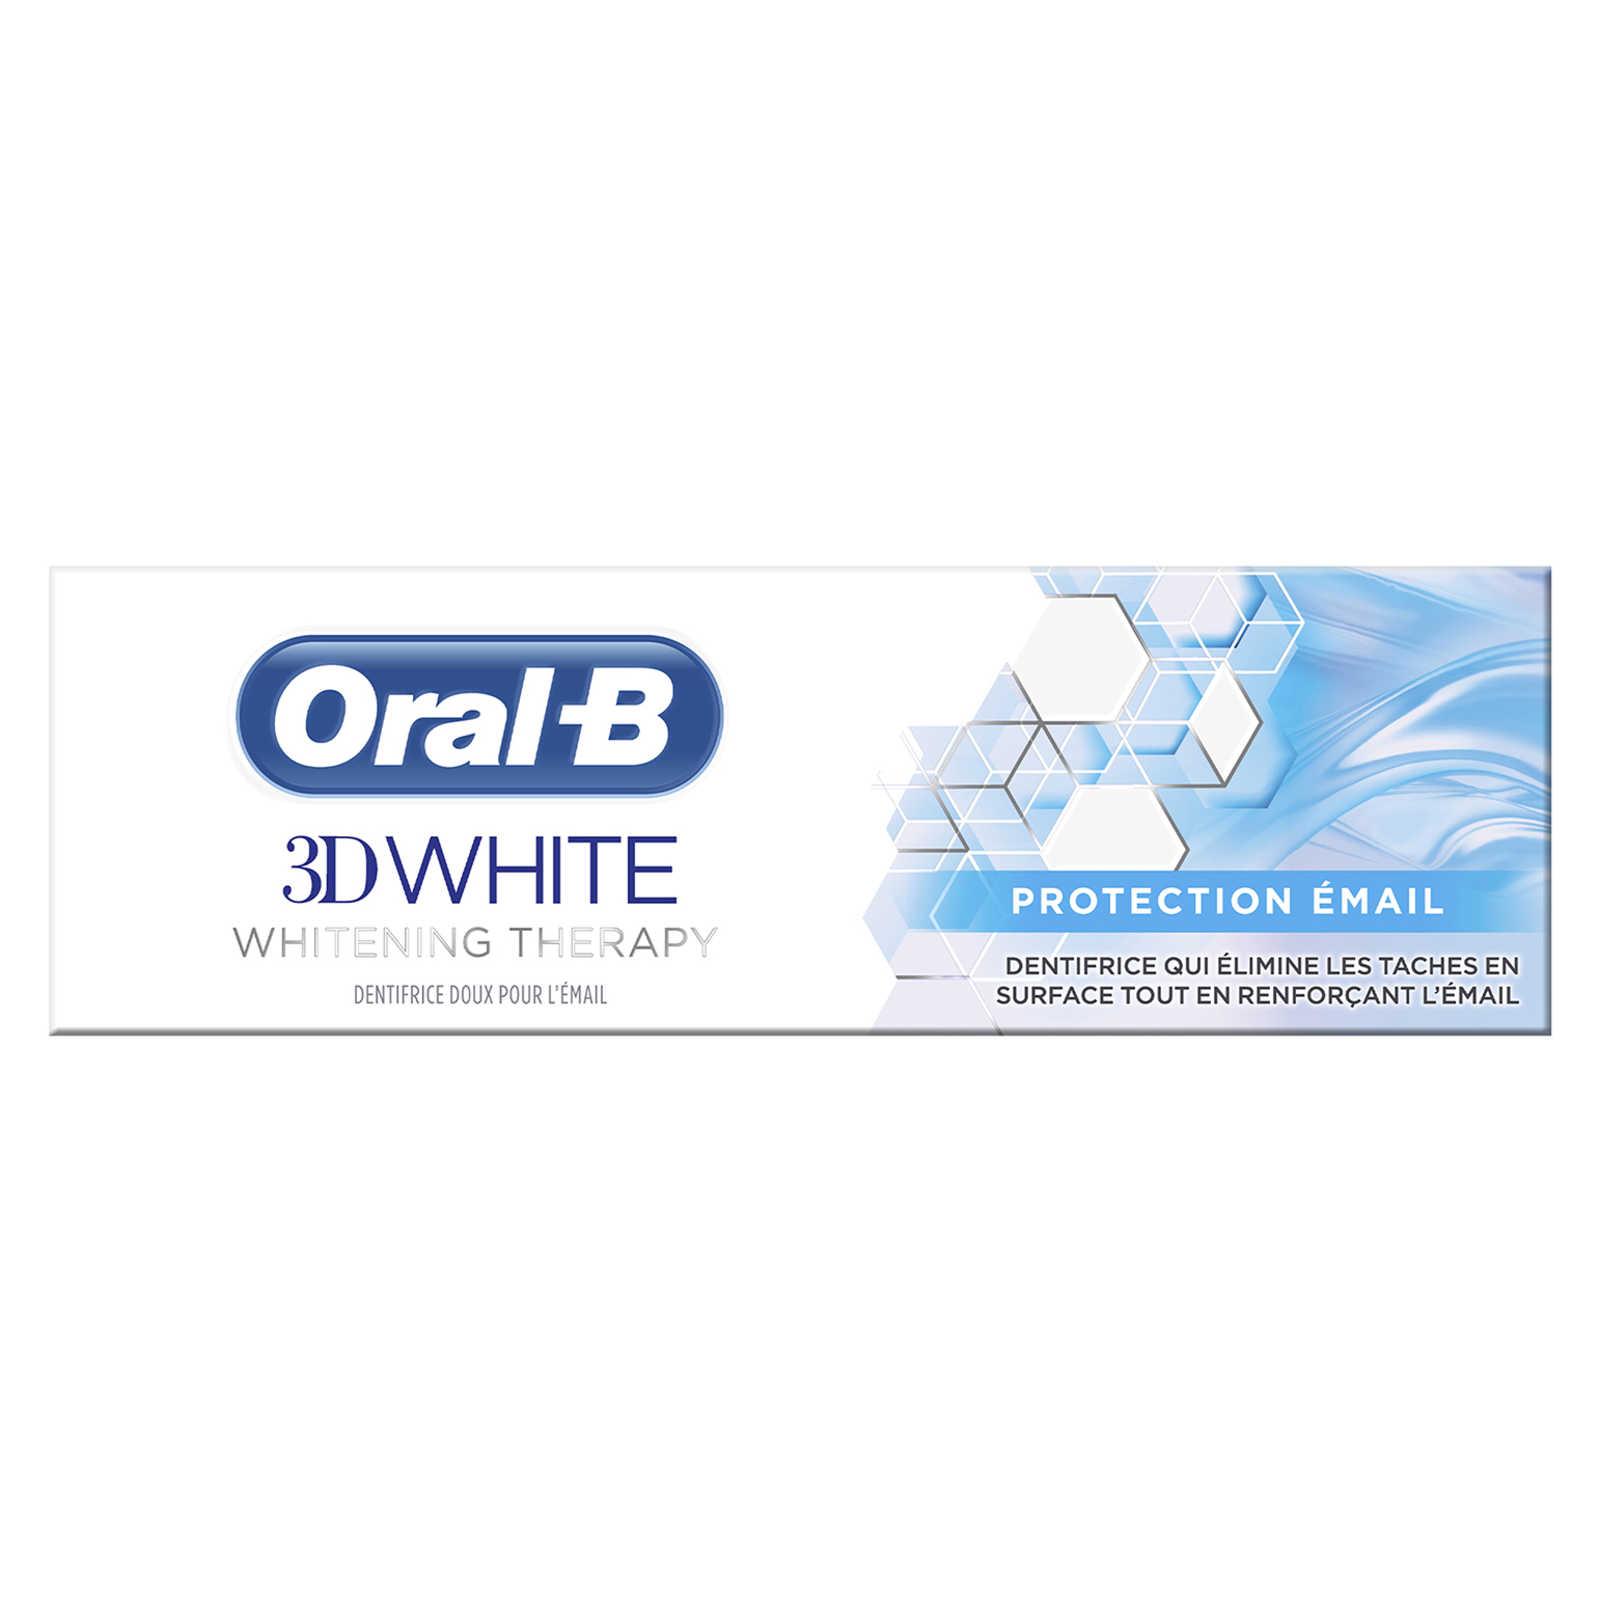 Oral-B-3D White